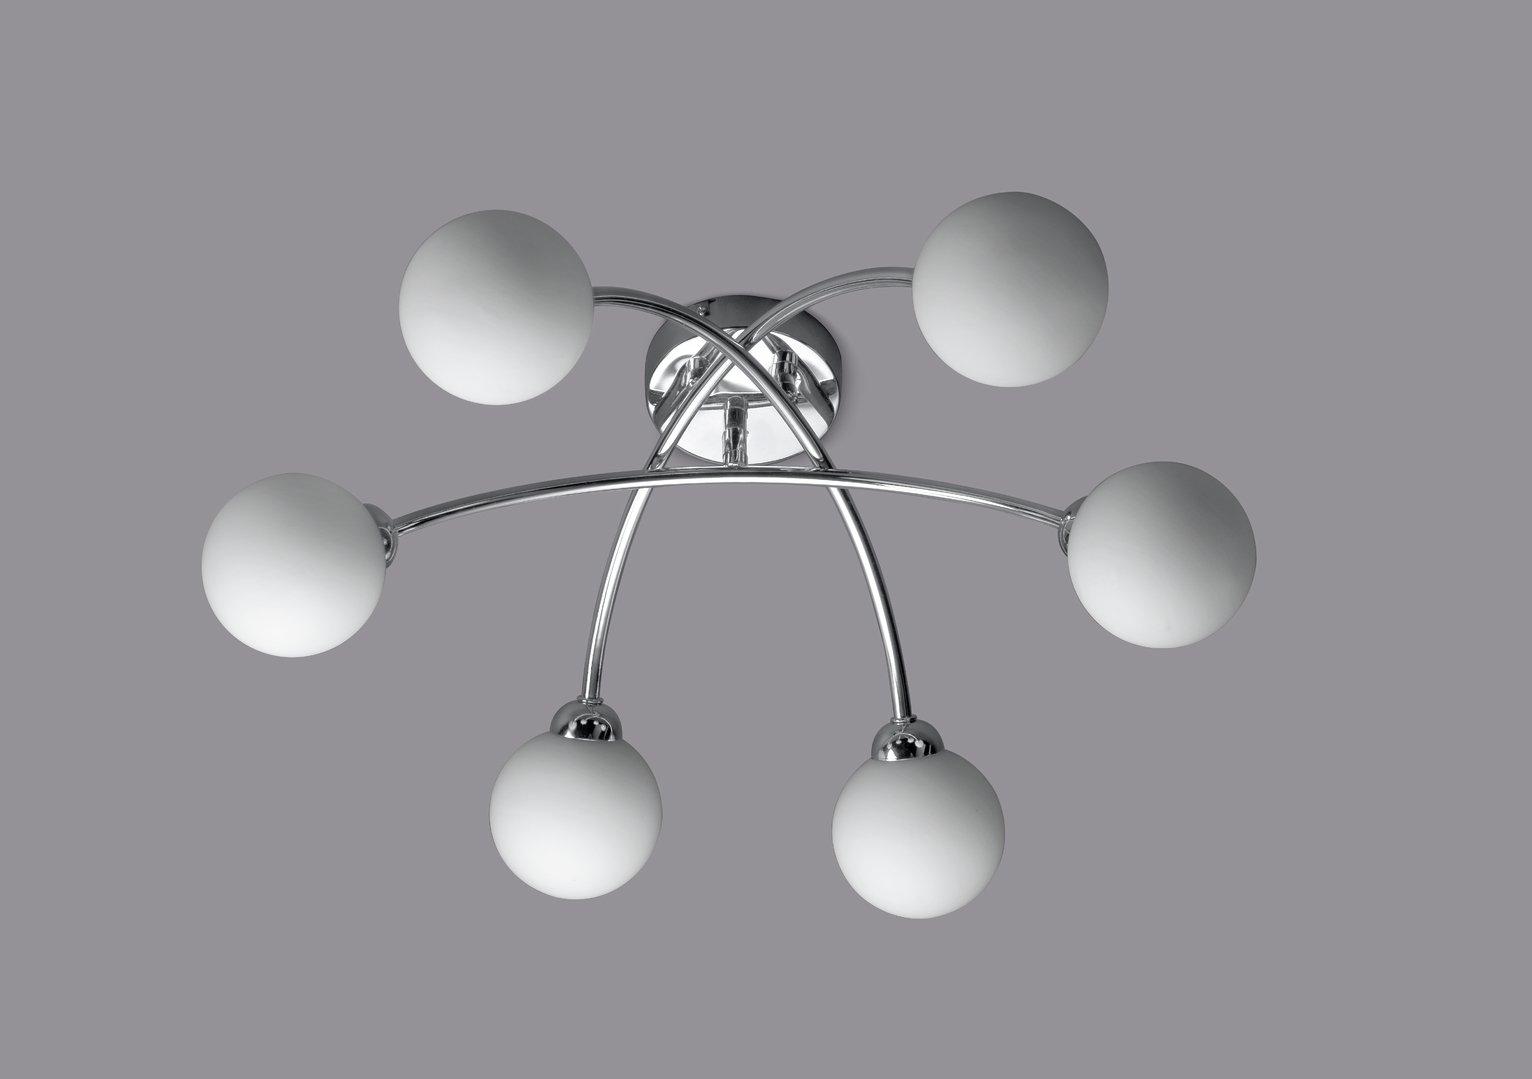 Argos Home Broadford 6 Globe Ceiling Light - Chrome